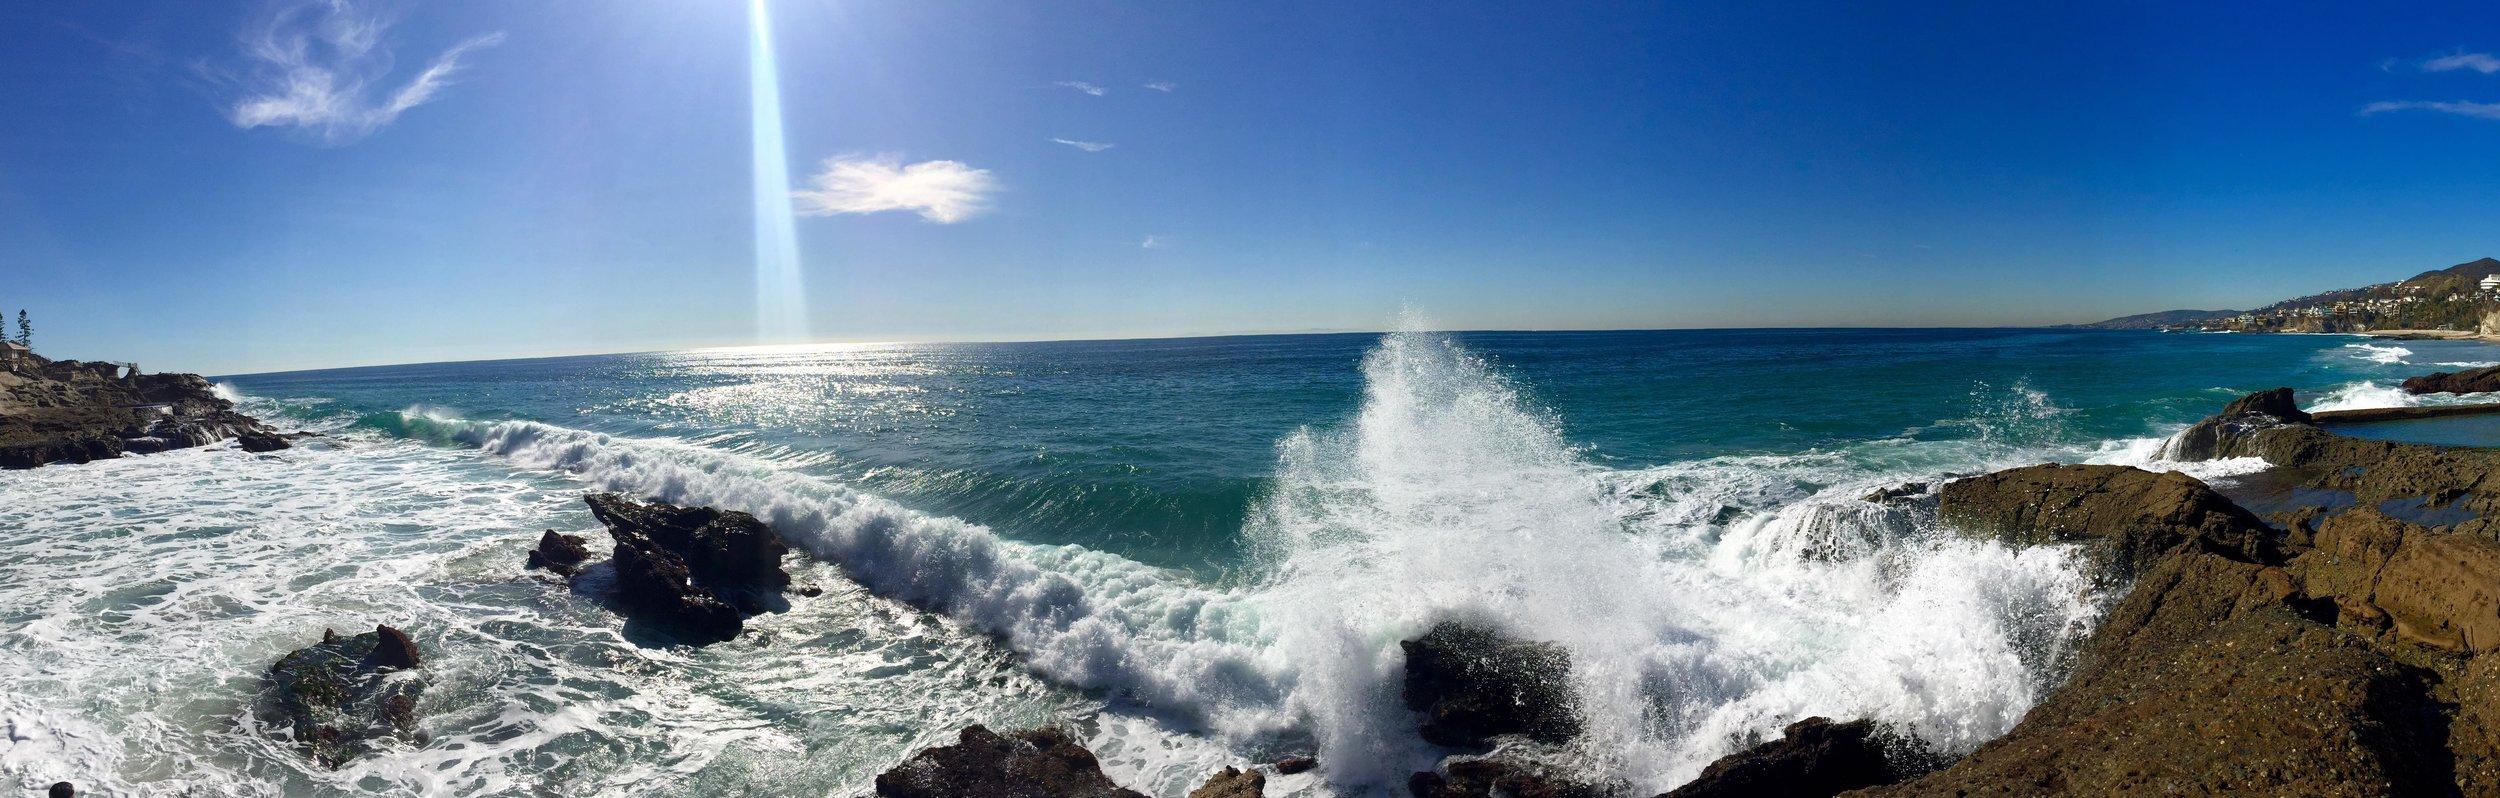 Thousand Steps Beach, Laguna Beach, California (February 2016)